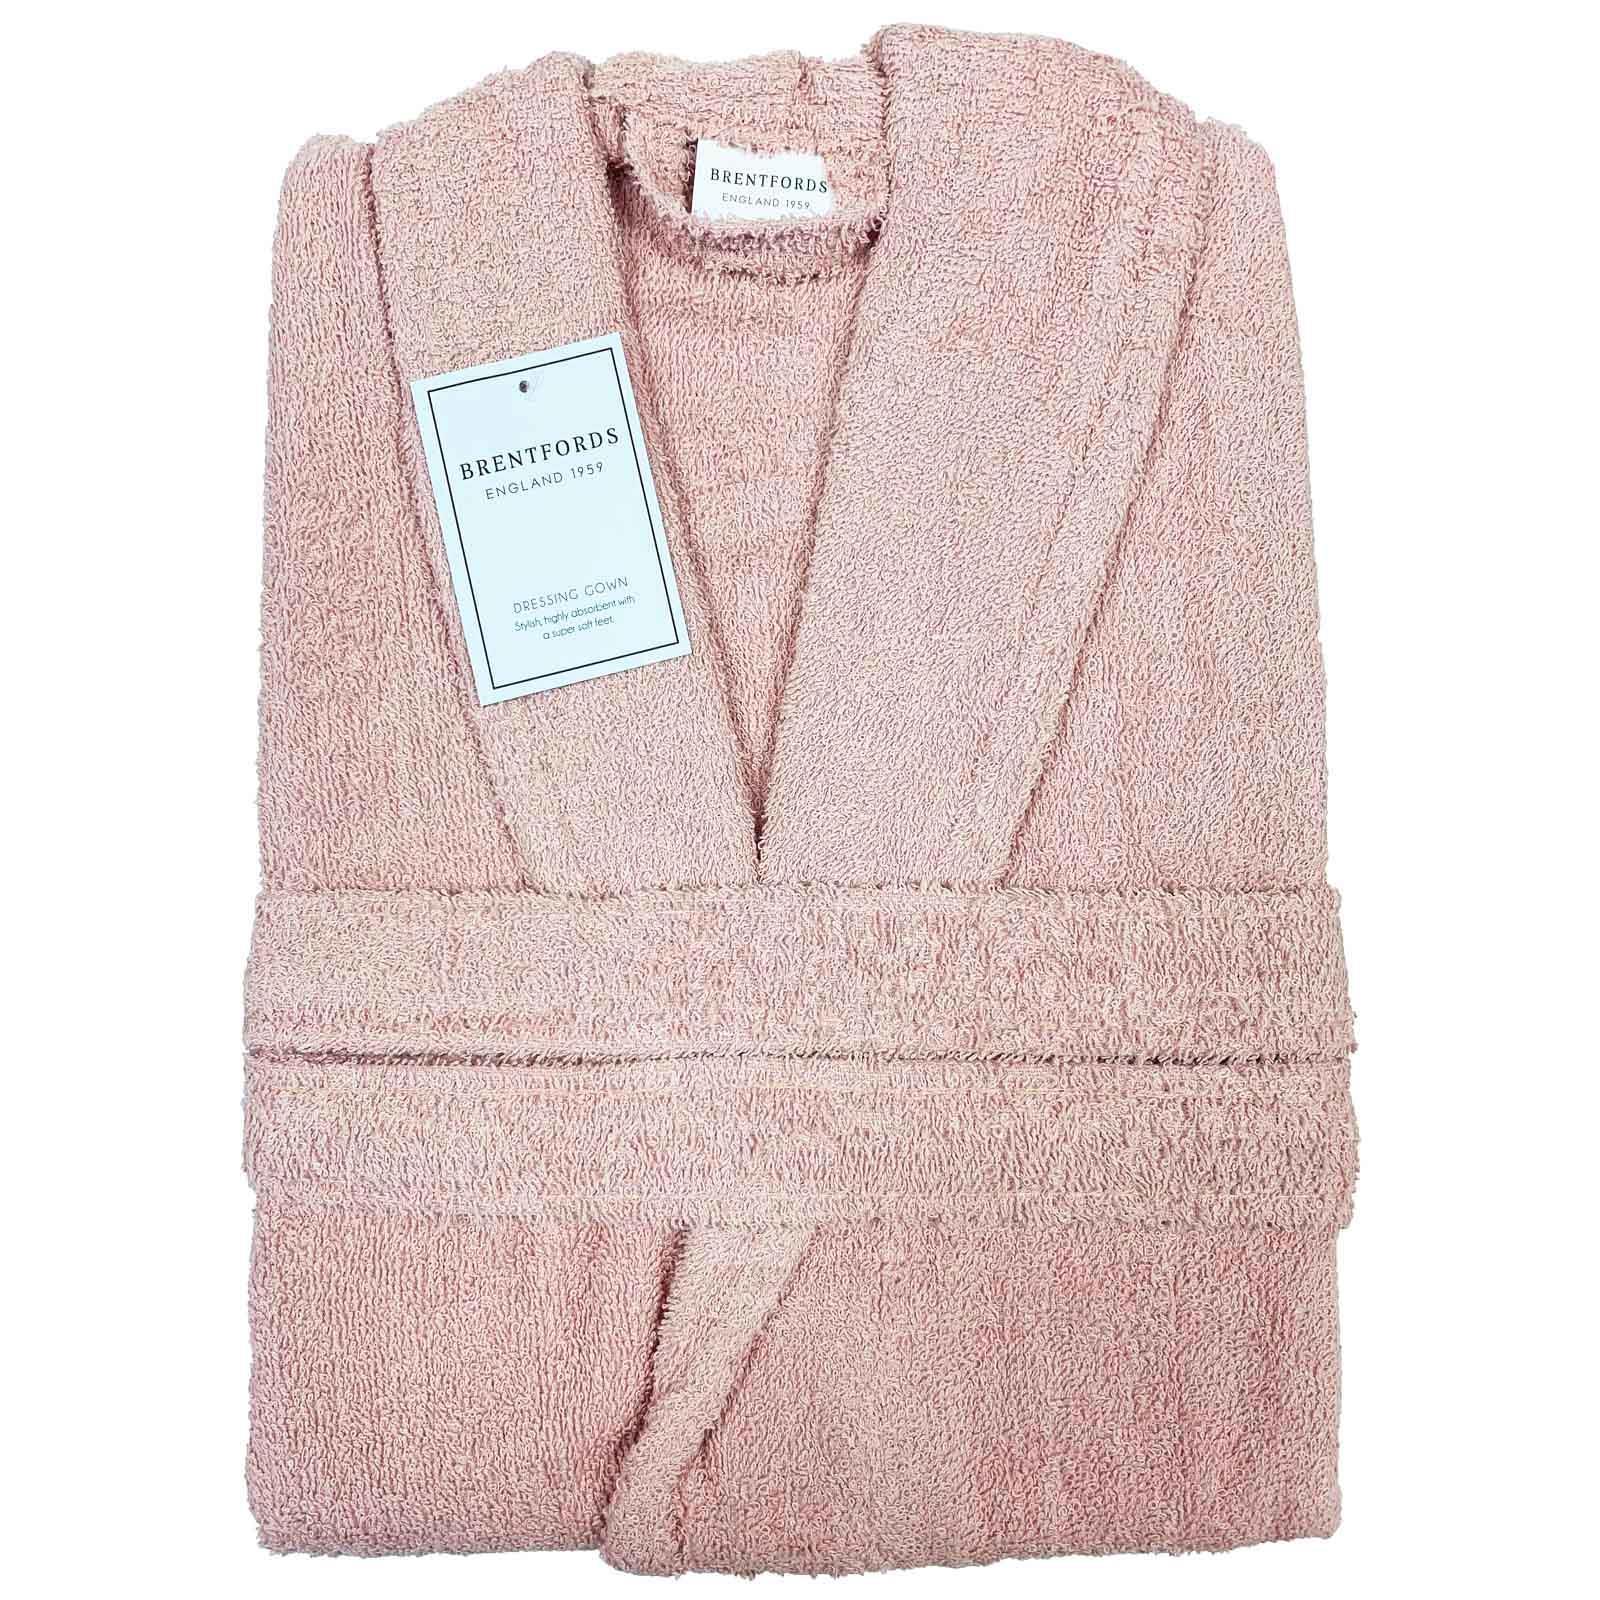 thumbnail 10 - Brentfords Luxury 100% Cotton Bath Robe Terry Towel Soft Dressing Gown Unisex